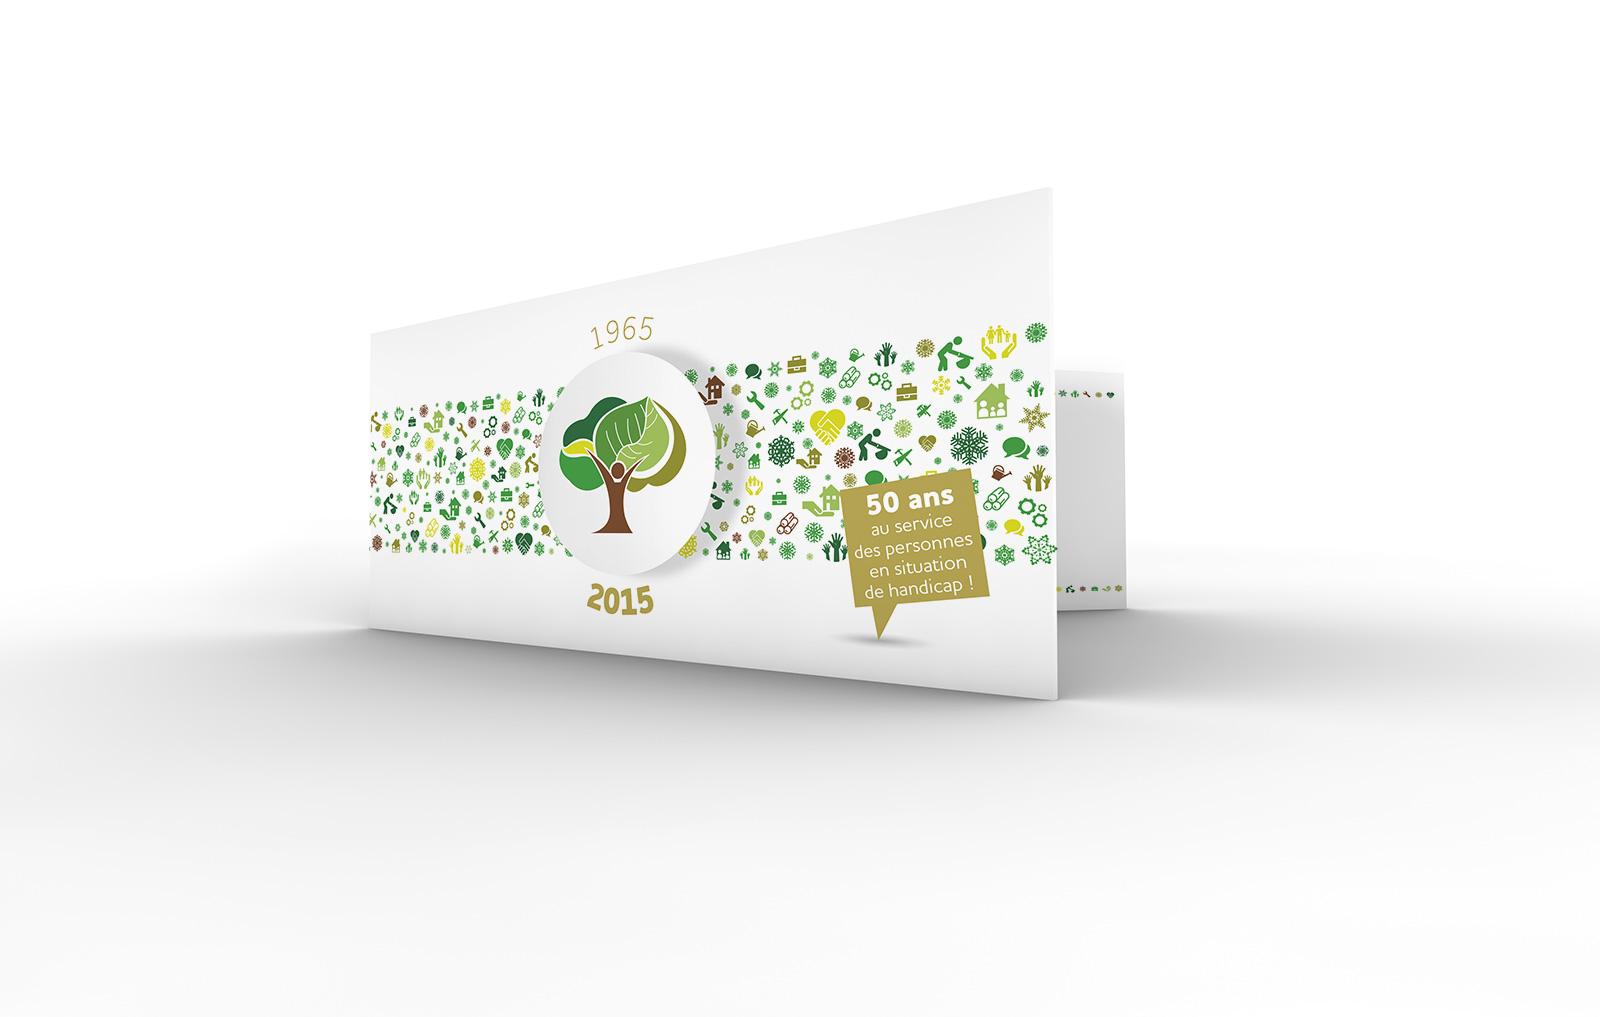 Simu-carte182824430